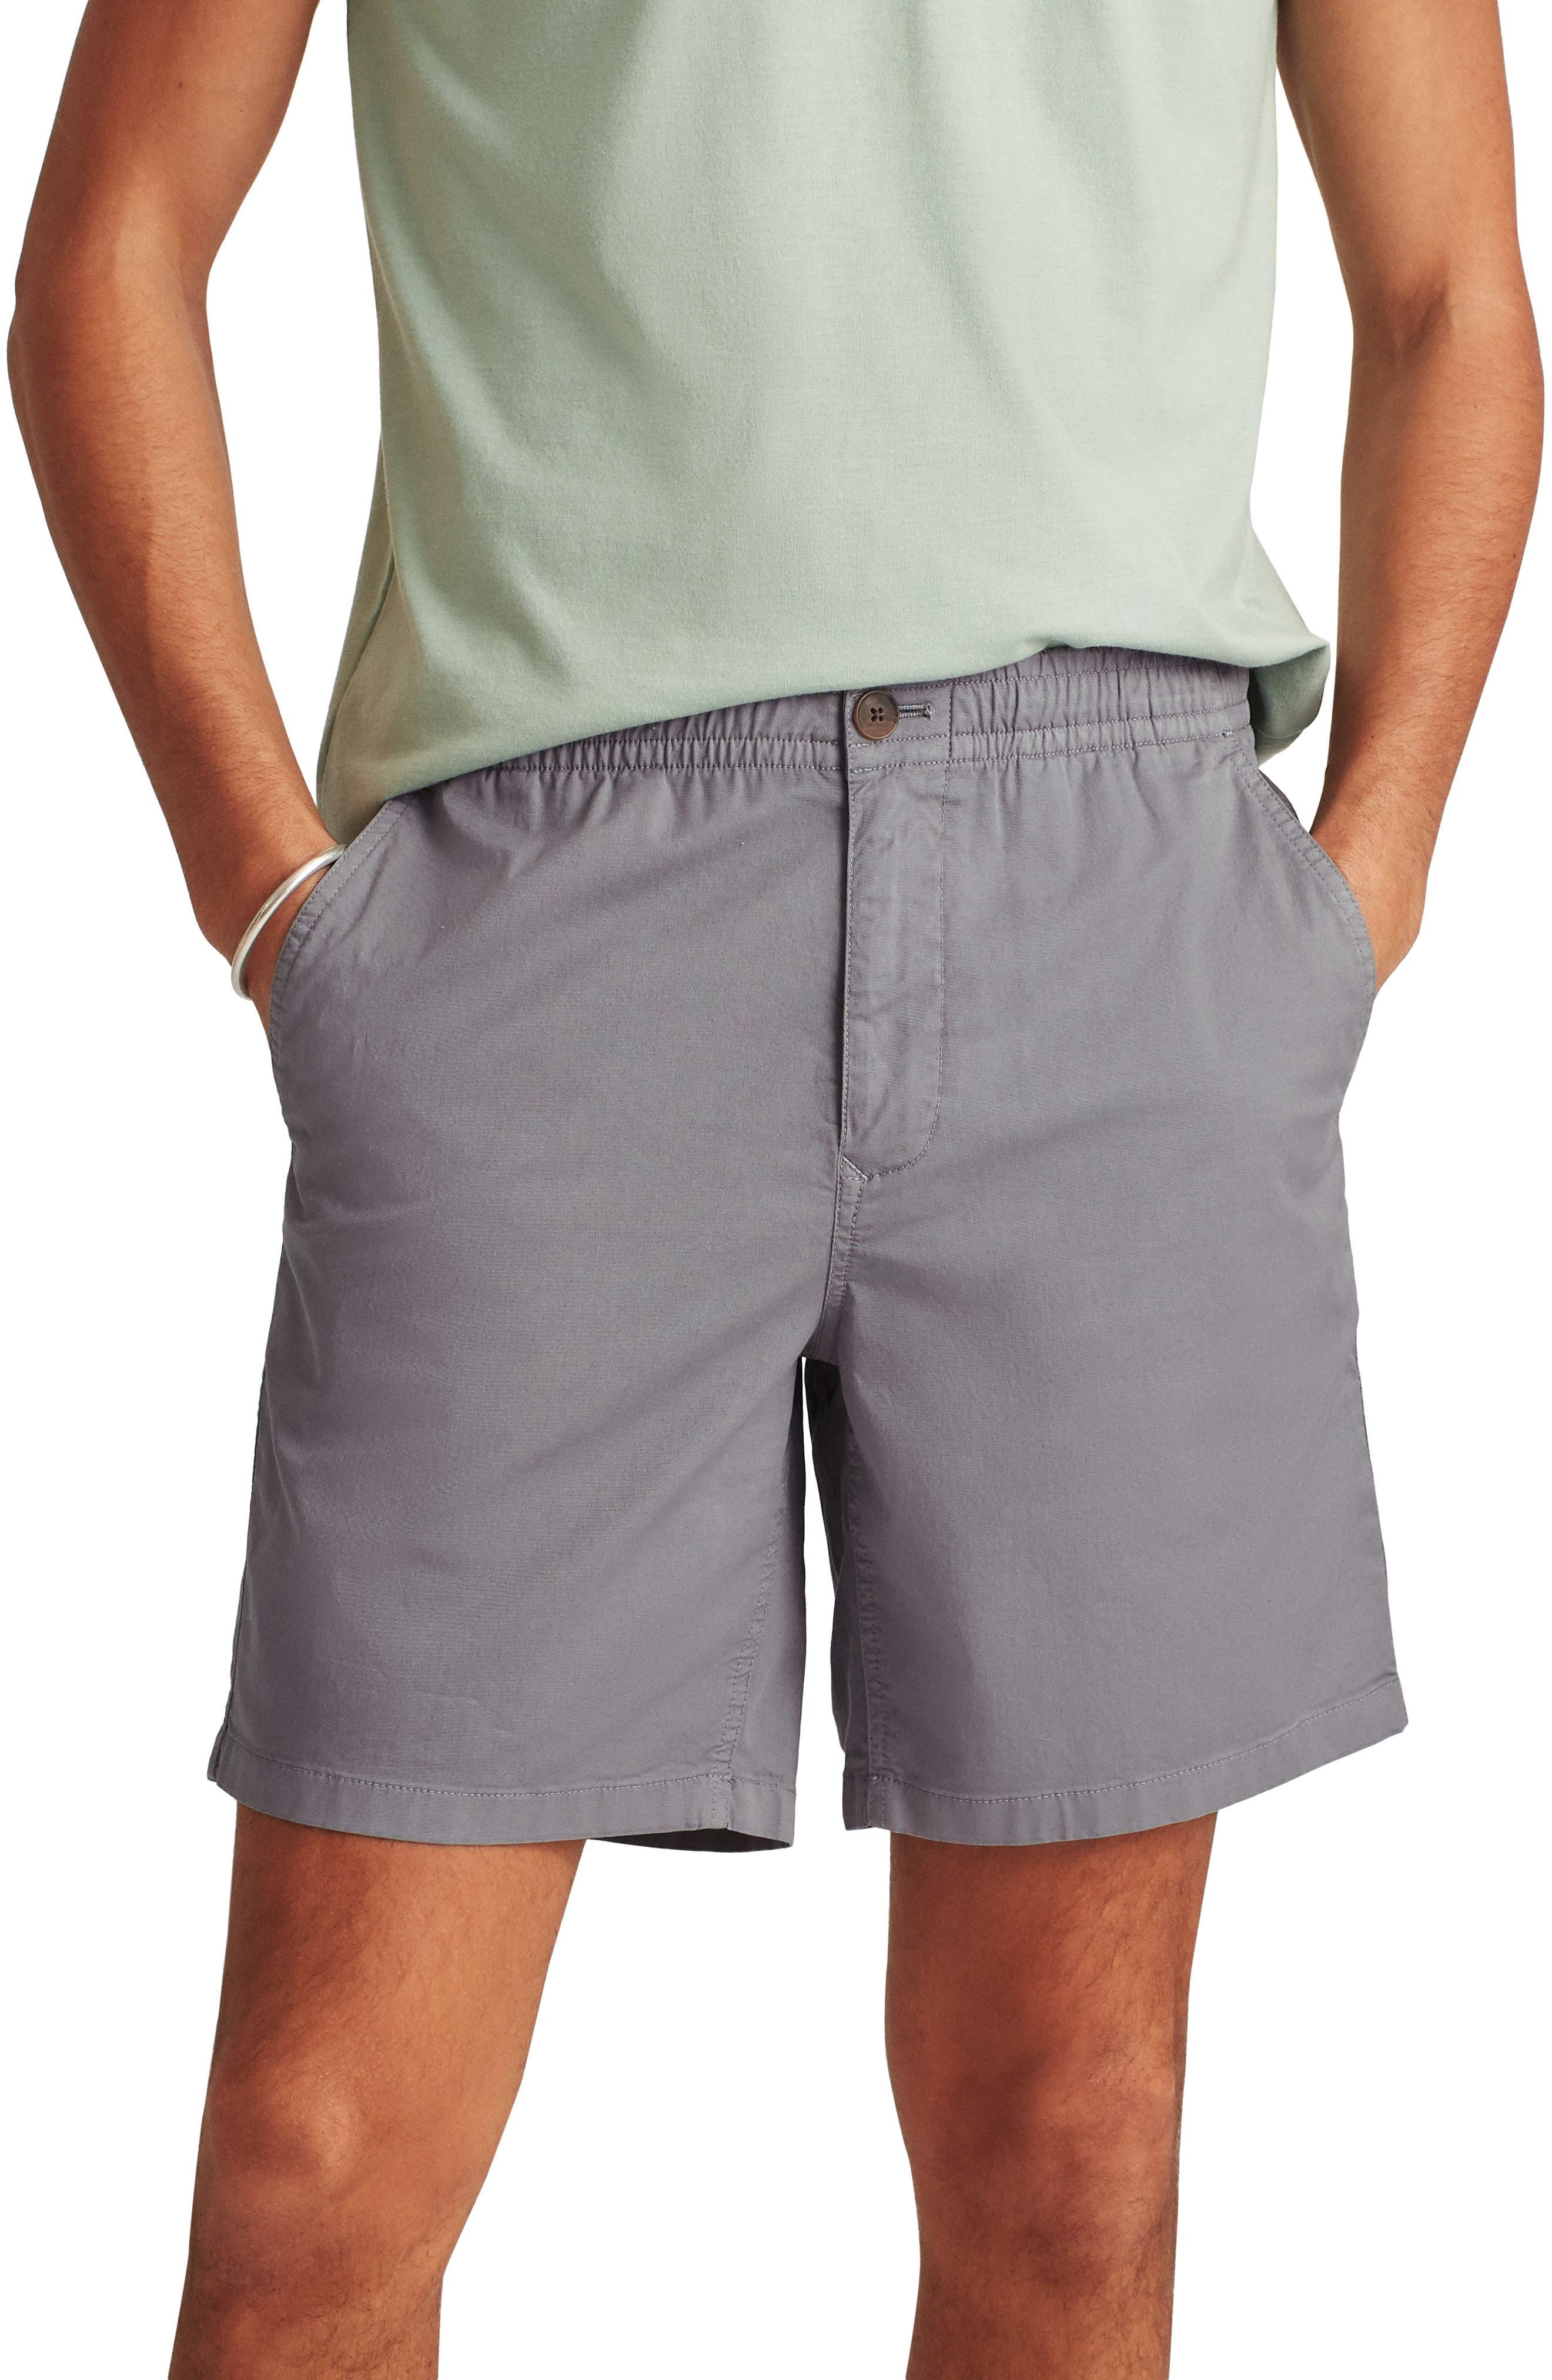 The Off Duty Twill Shorts